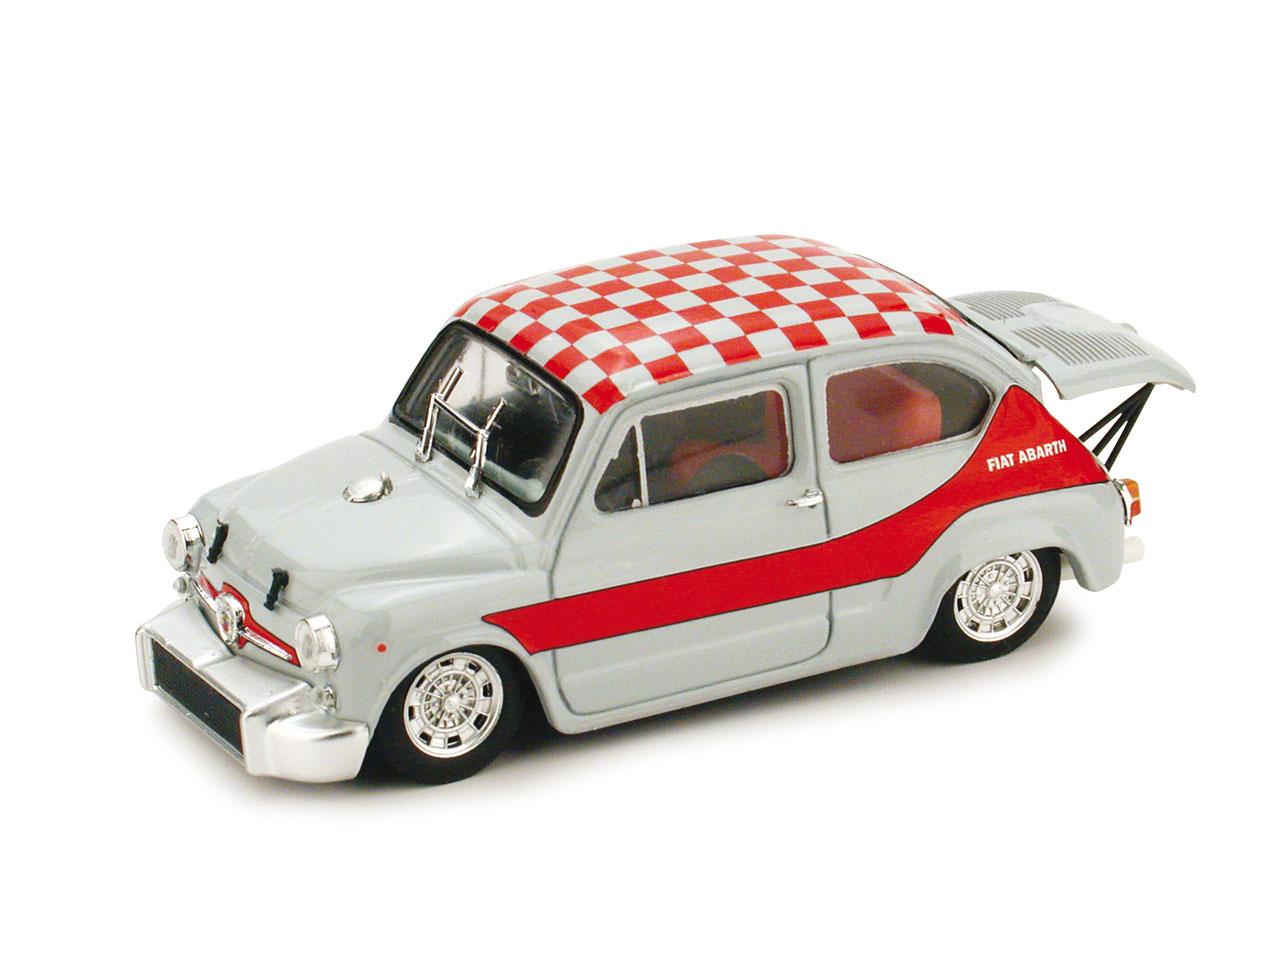 Fiat Abarth 1000 Corsa Gr. 5 (1968) Brumm 1/43 Gris - Rojo